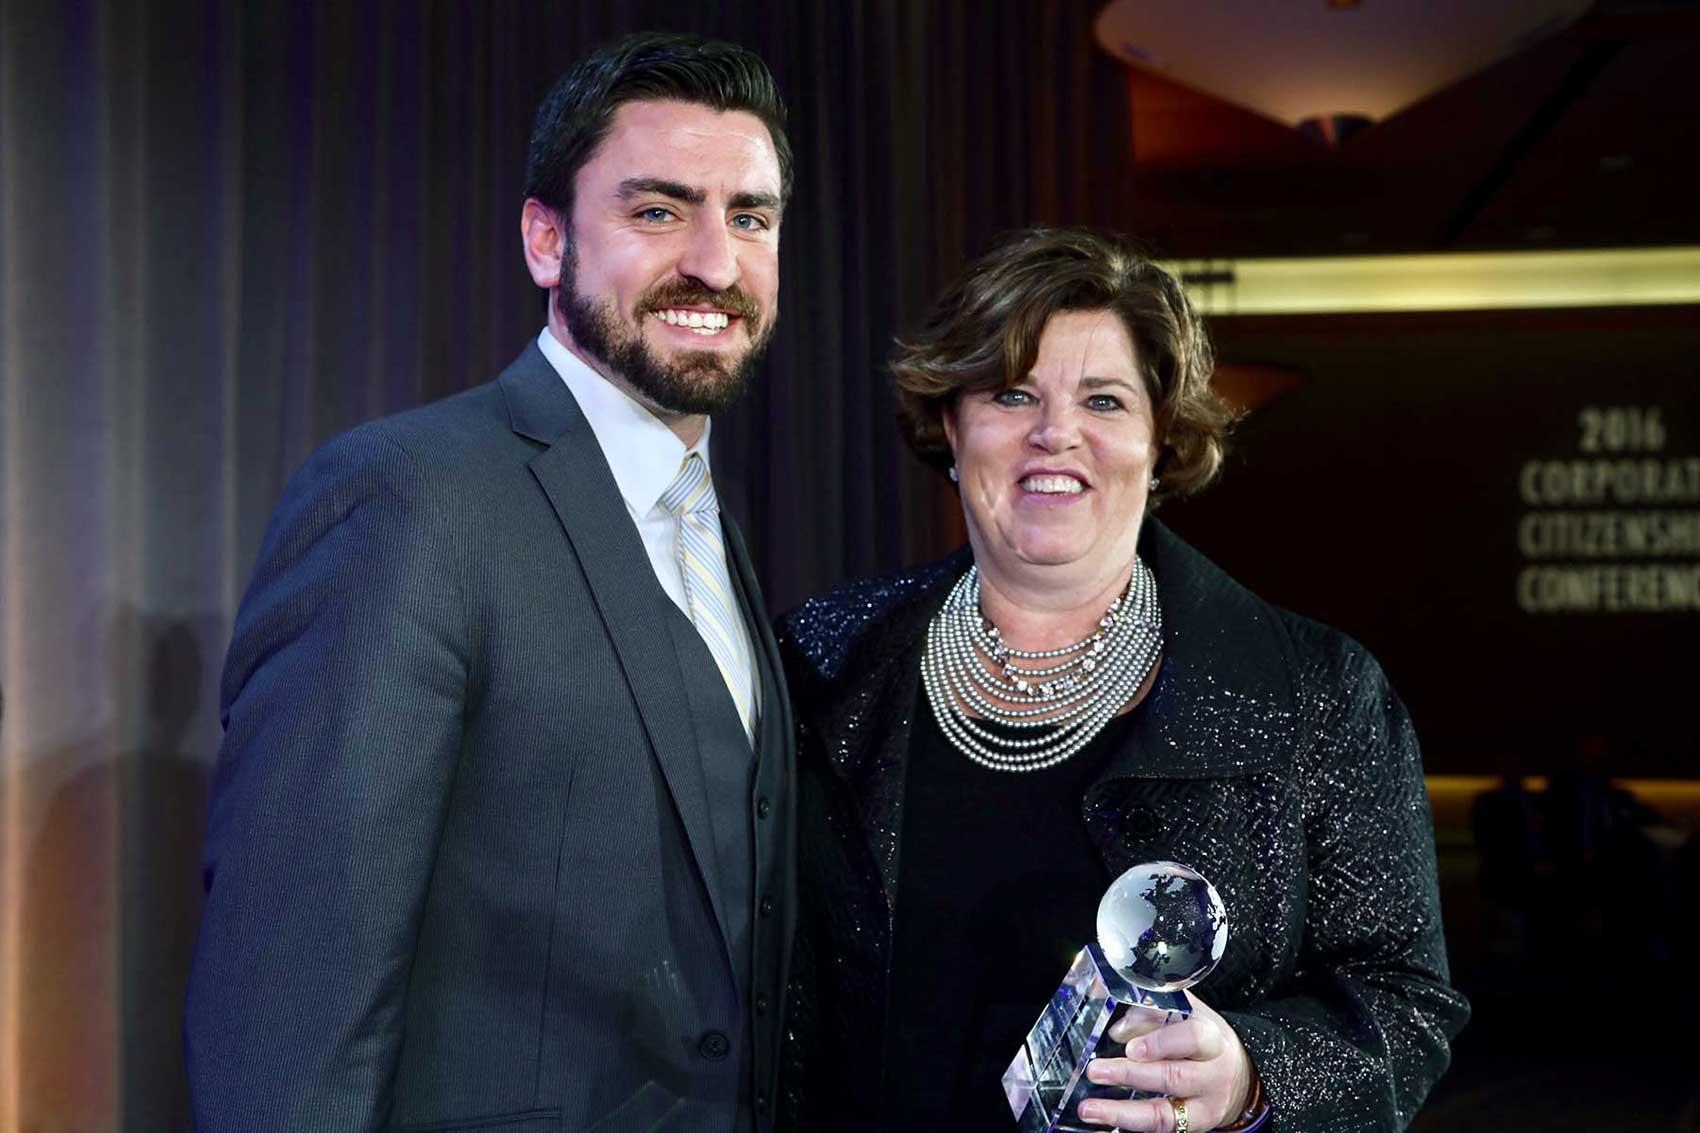 Reuben Smith-Vaughan Executive Director of AACCLA presents Kelly M. Semrau of SC Johnson the 2016 Western Hemisphere Corporate Citizenship Award